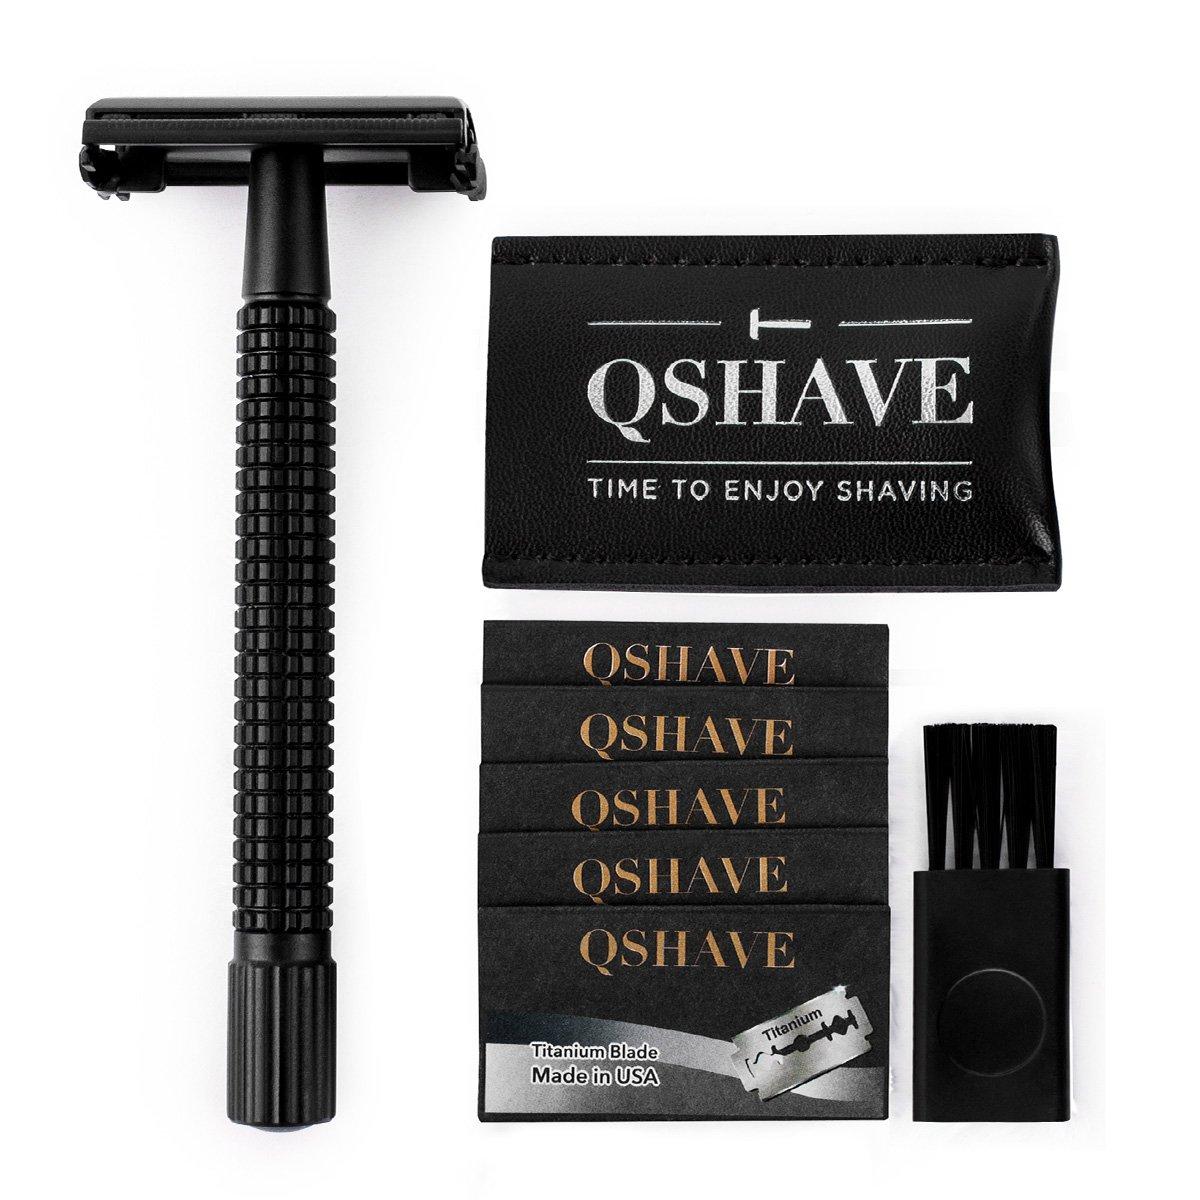 QSHAVE Double Edge 4 inch Long Handle Safety Razor Twist Butterfly Open Matte Black Steel Coating (1 Razor + 5 pcs Titanium Coated Blades + Leather Travel Case)